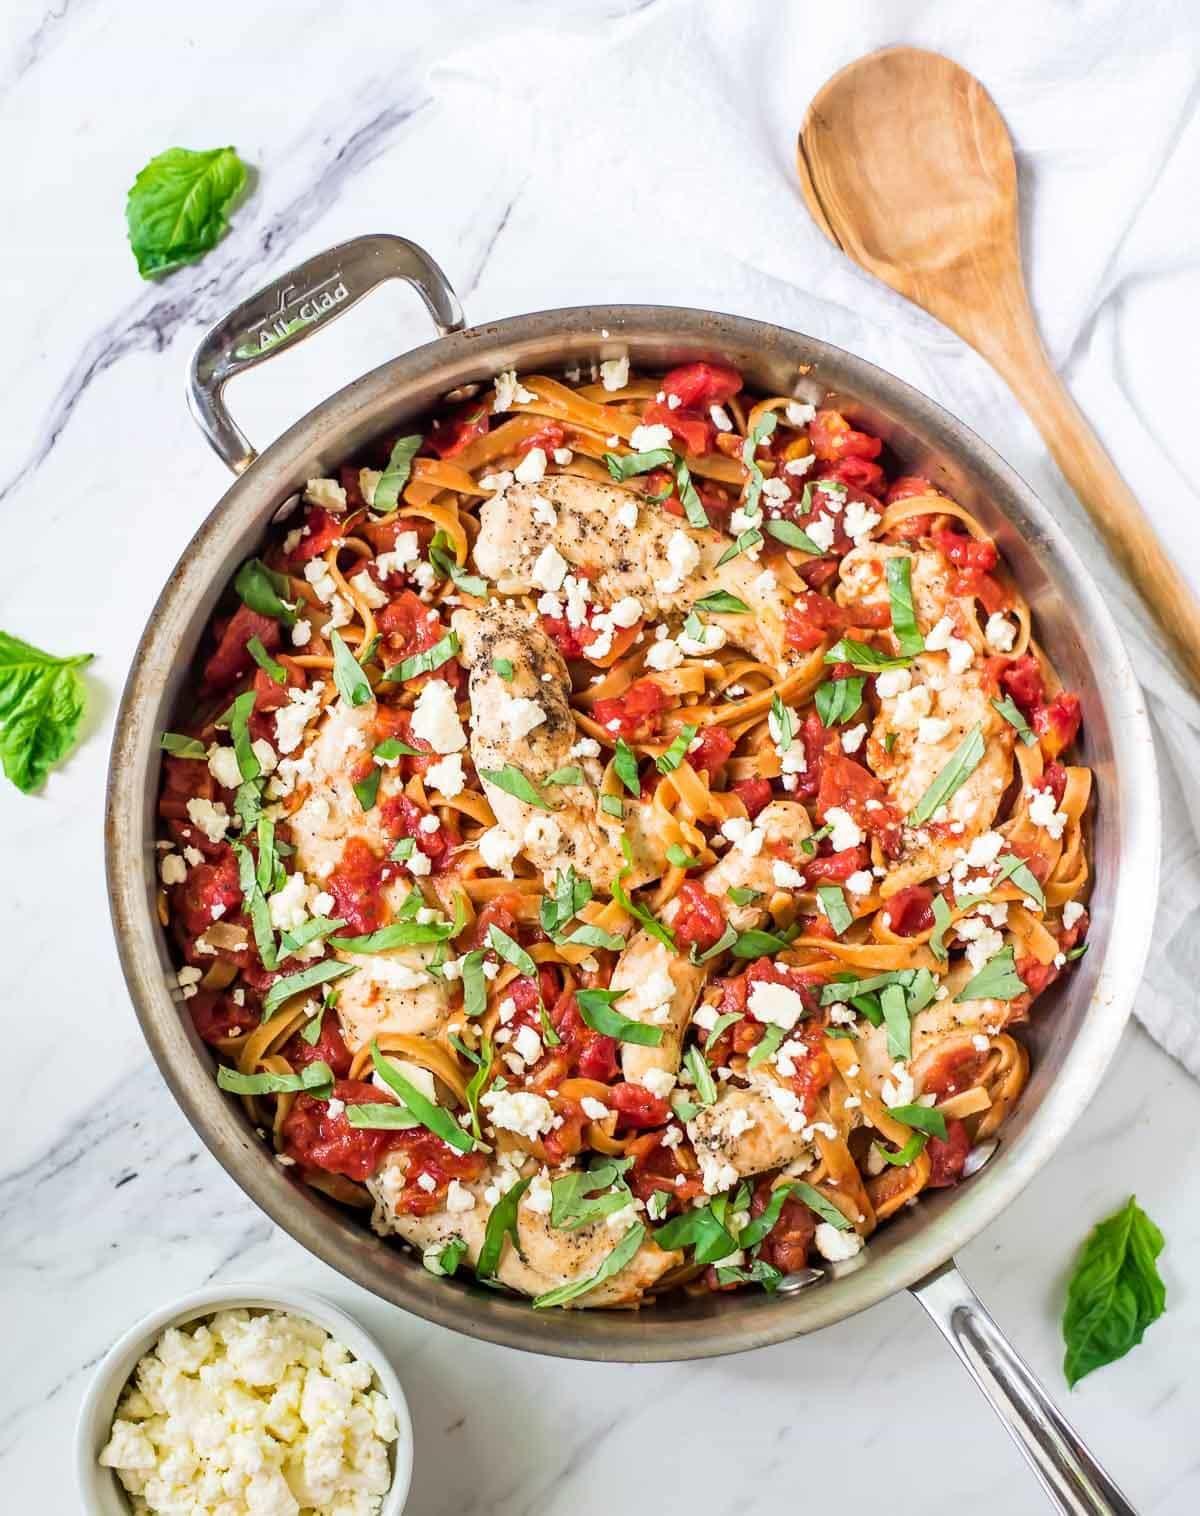 Tomato-Basil-Chicken-Pasta-with-Feta